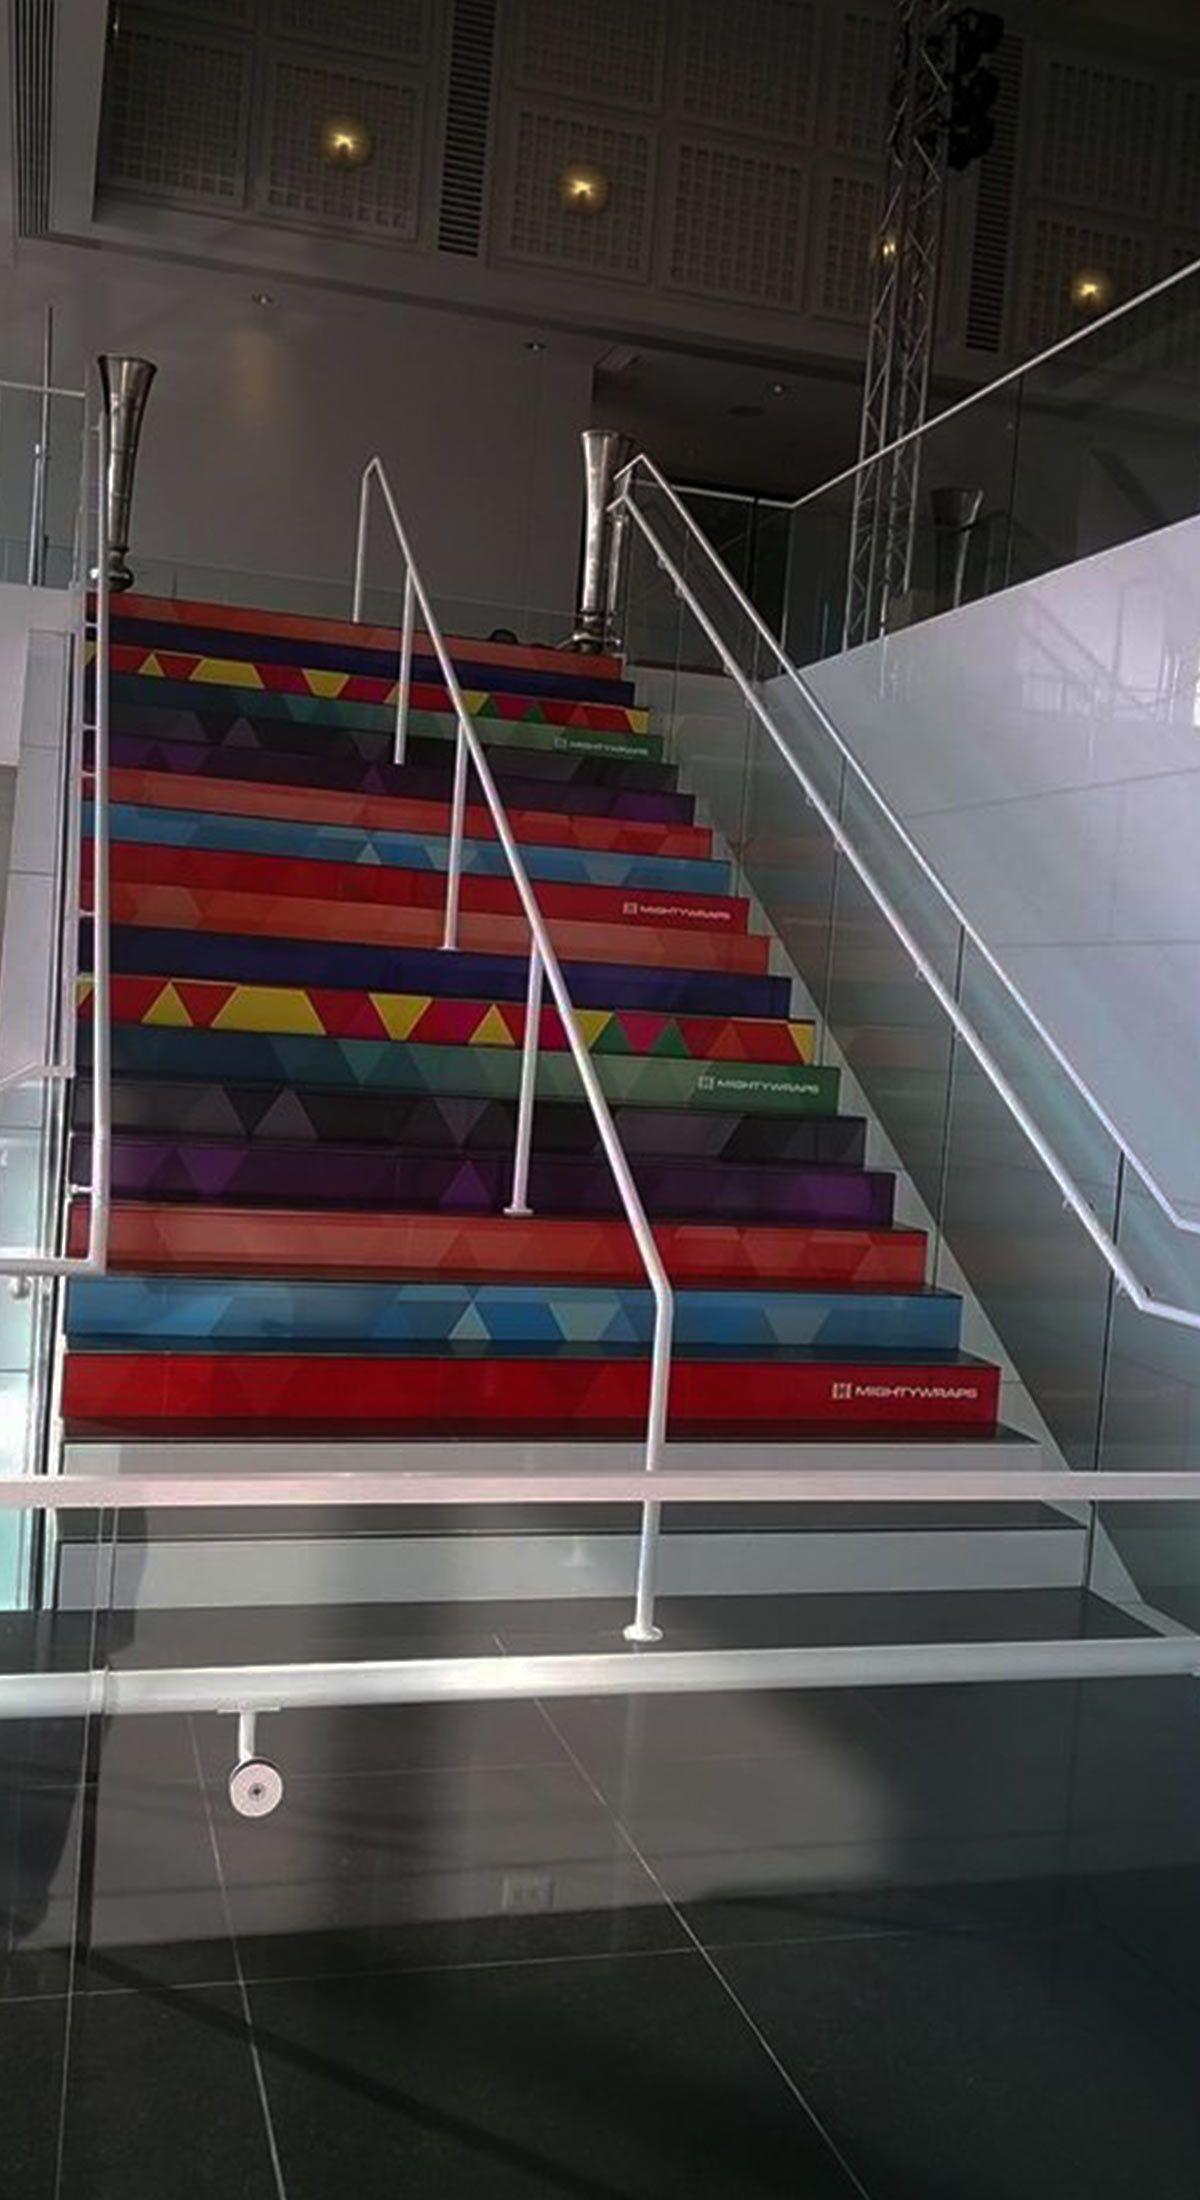 Wichita Art Museum - Staircase and Railing Wraps